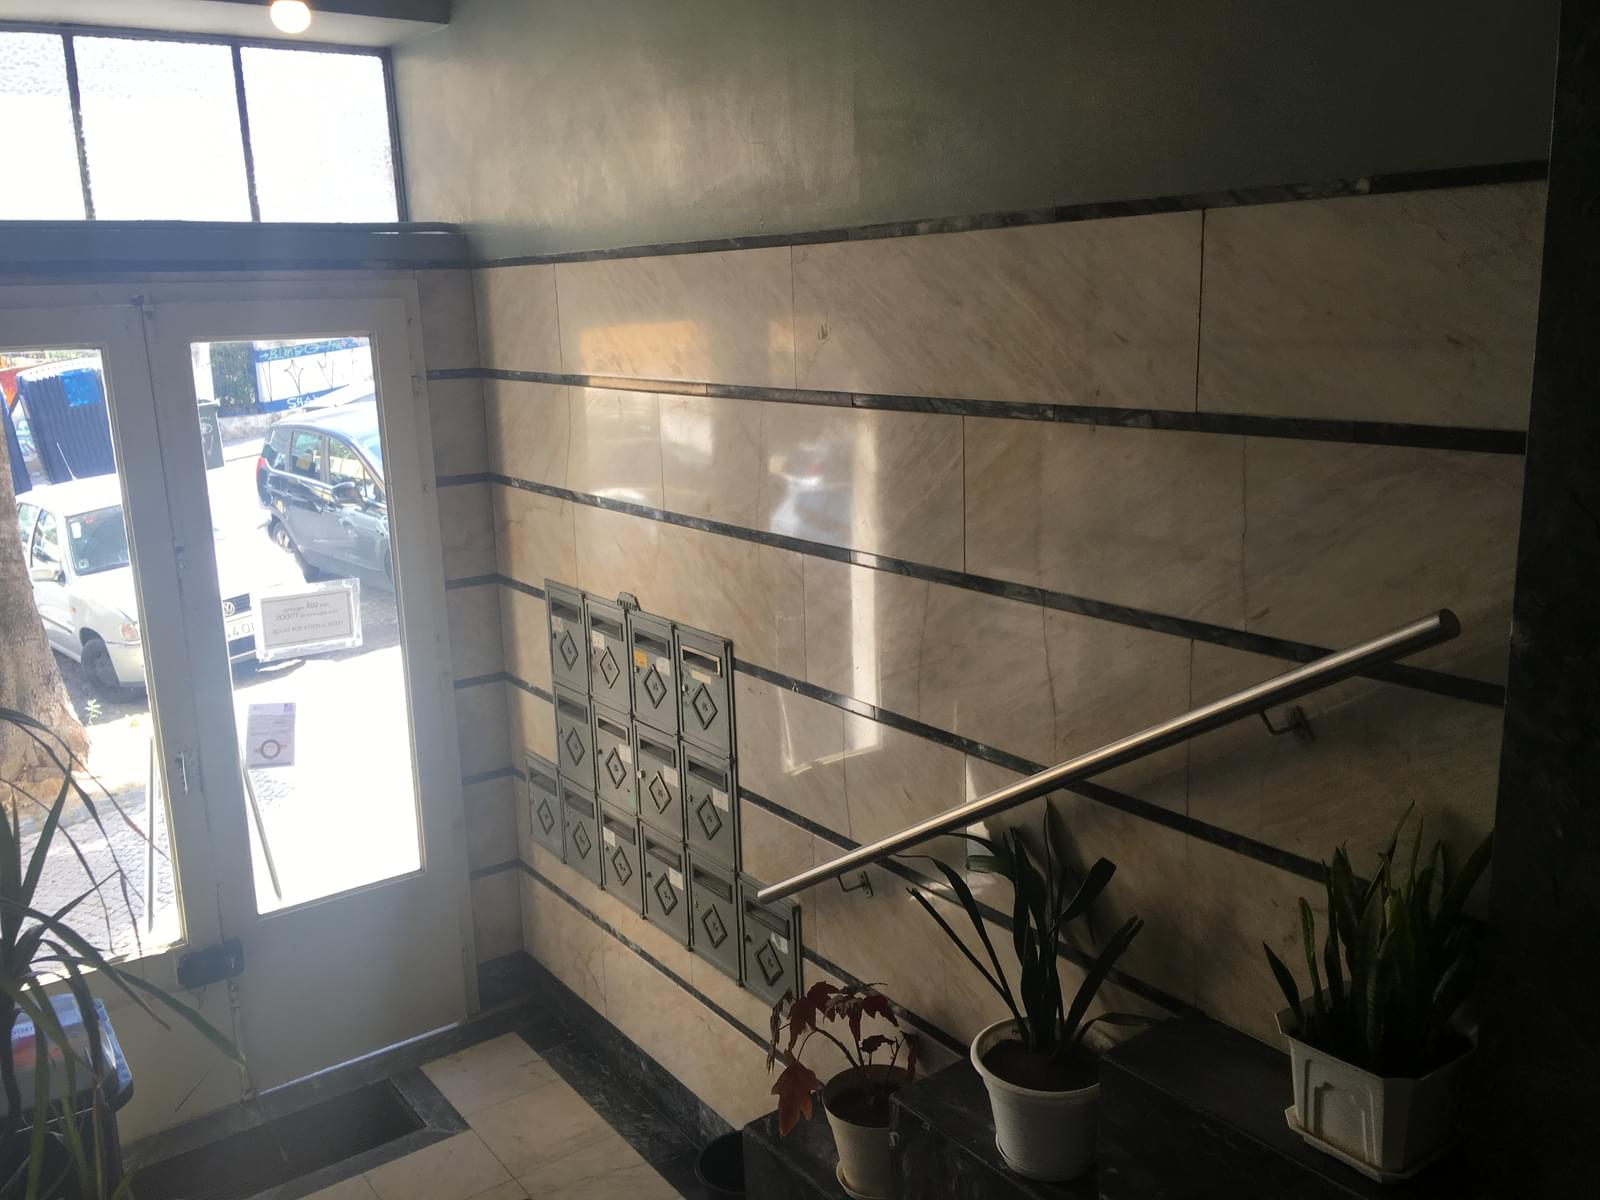 pf17642-apartamento-t3-lisboa-1563e40e-5359-45da-80da-465a7be0a102